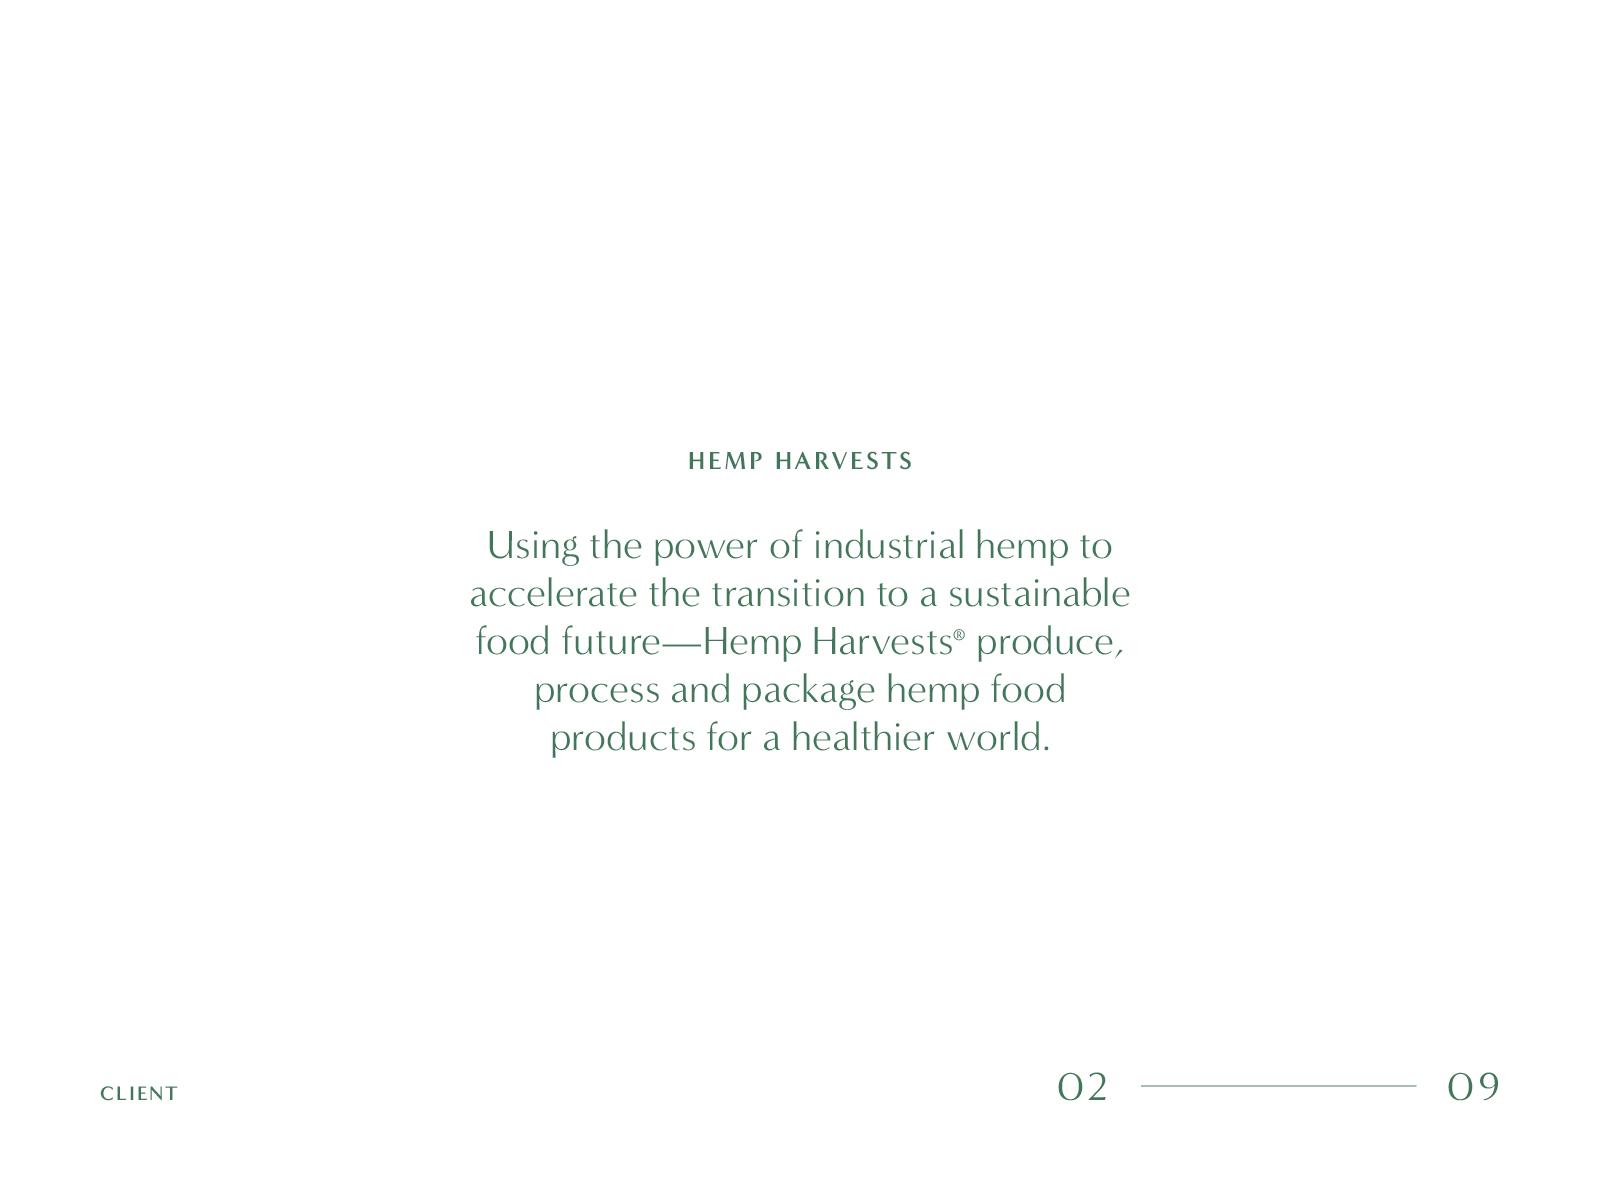 hempharvests-project-web-2.jpg